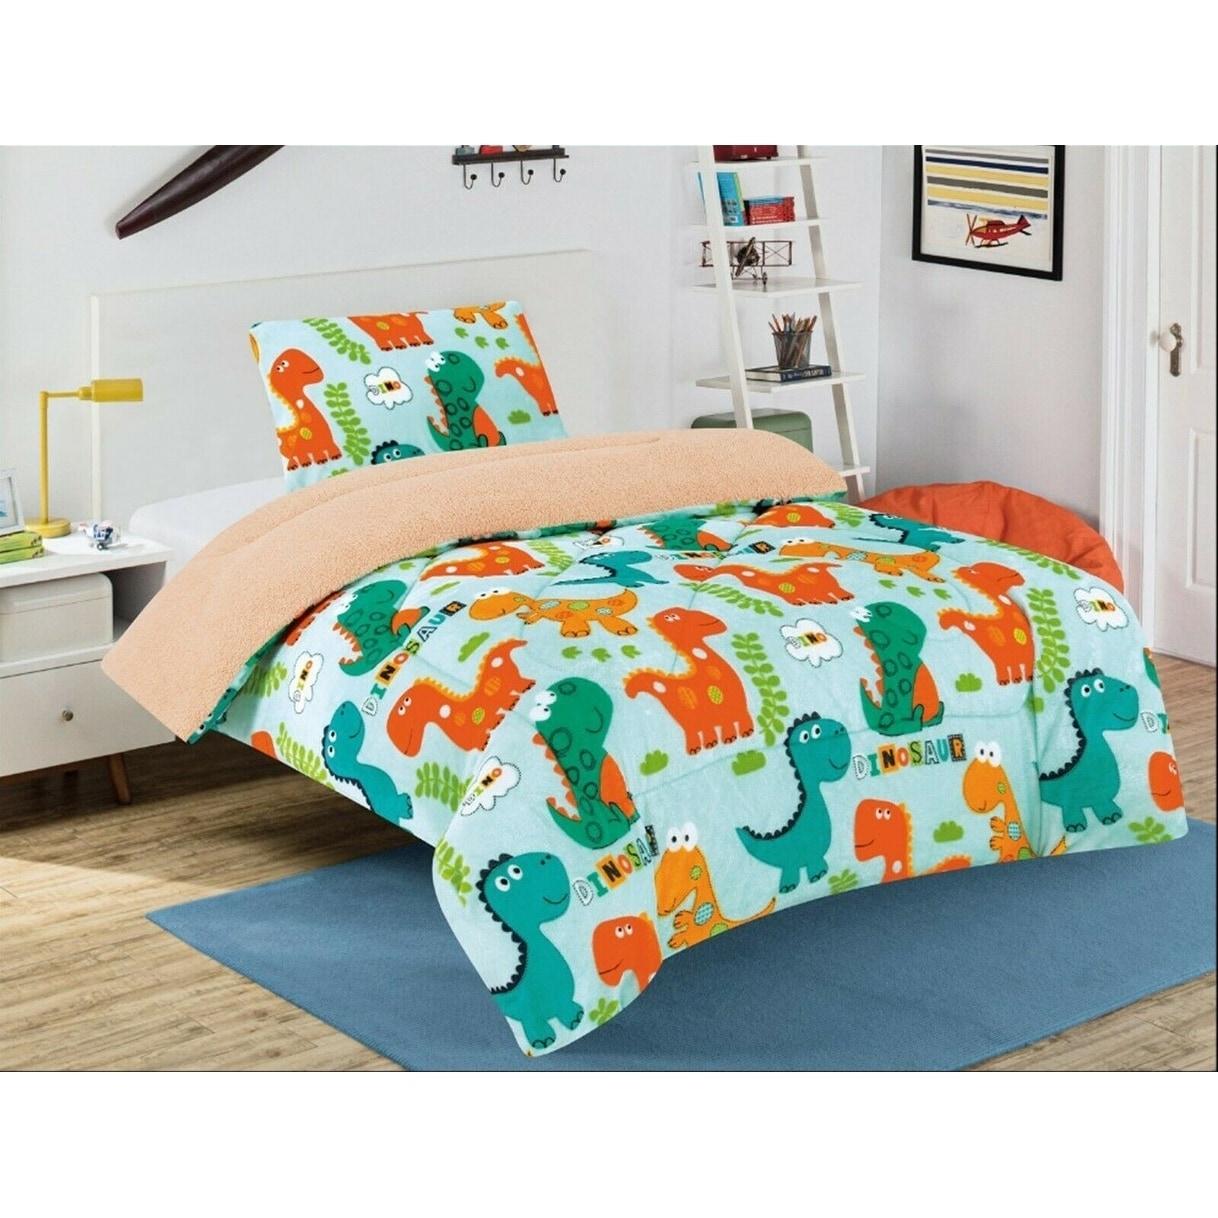 Shop Taylor & Olive Twin size Plush Dinosaur Bedding Set